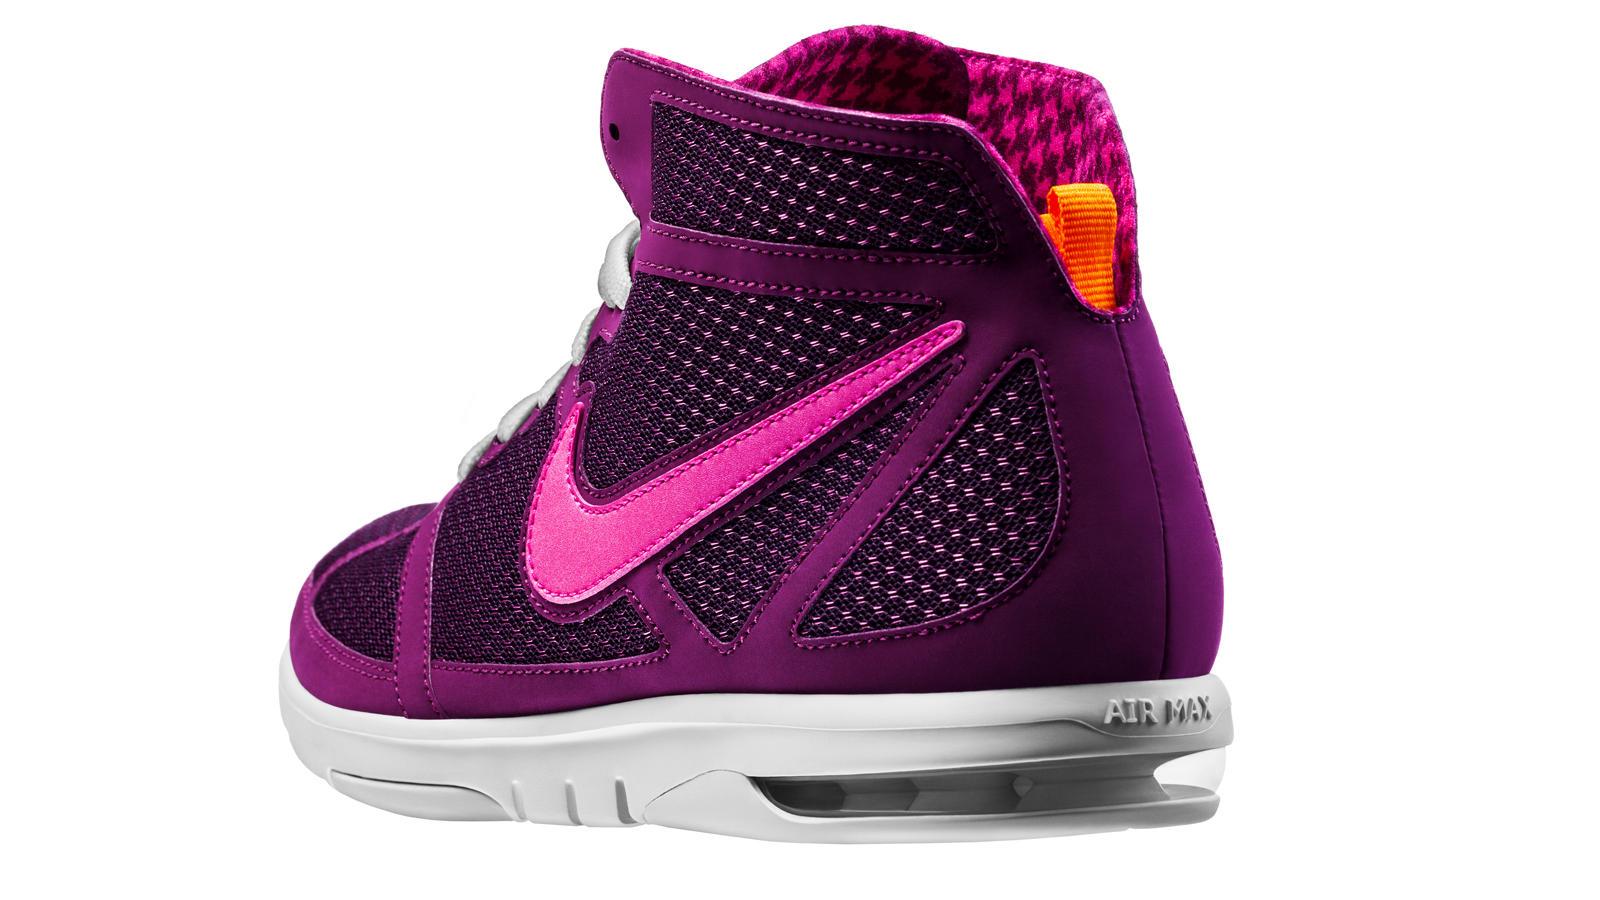 Femmes Nike Air Max S2s Midsouth